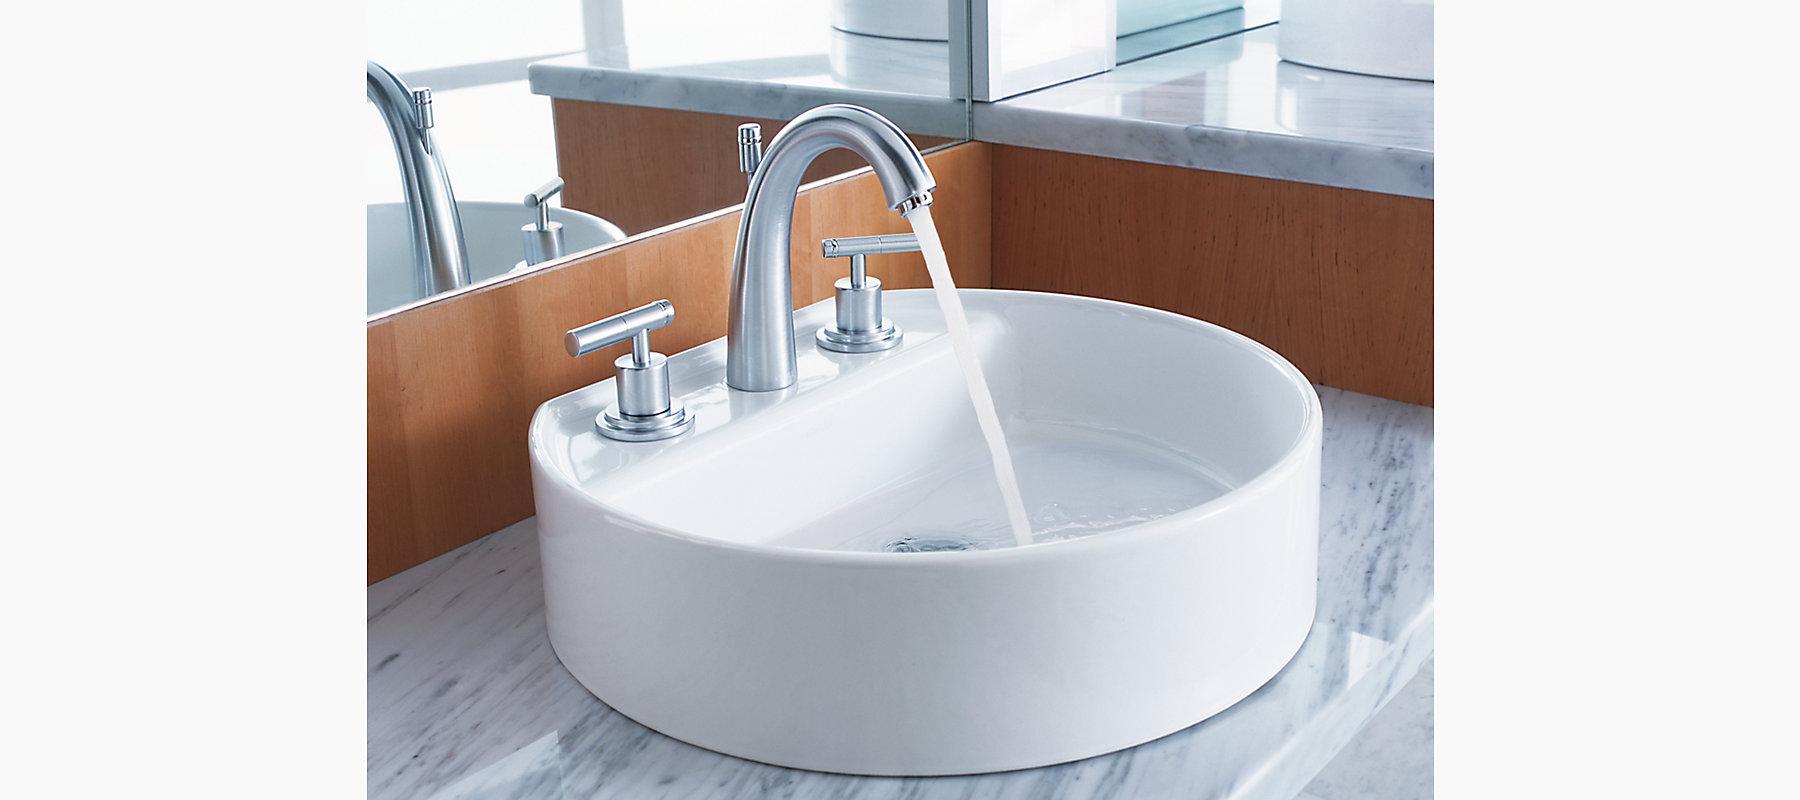 Taboret Widespread Sink Base Faucet with Escutcheons | K-8215-K | KOHLER